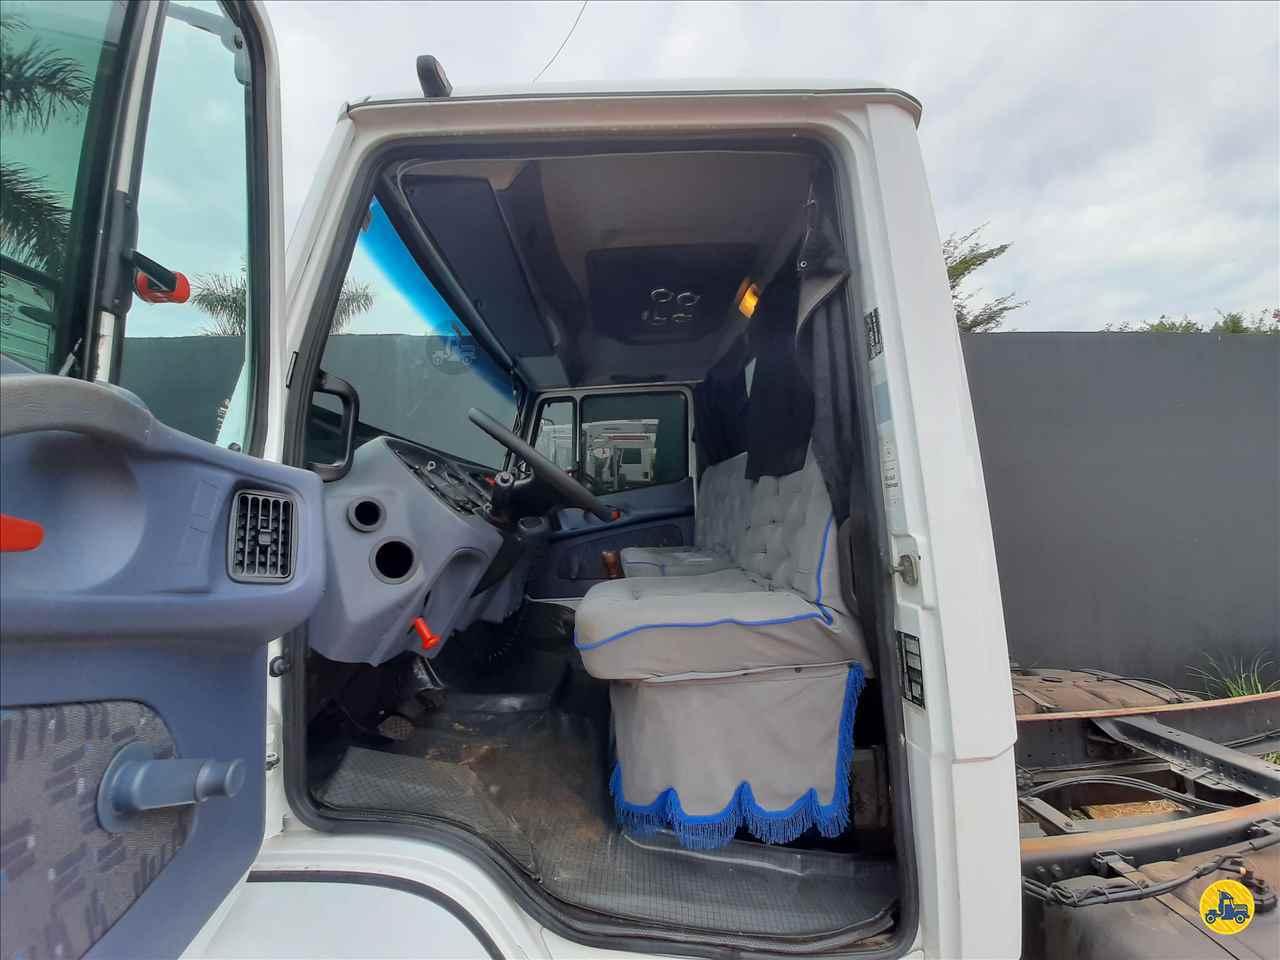 MERCEDES-BENZ MB 1318 600000km 2009/2009 Ravel Trucks